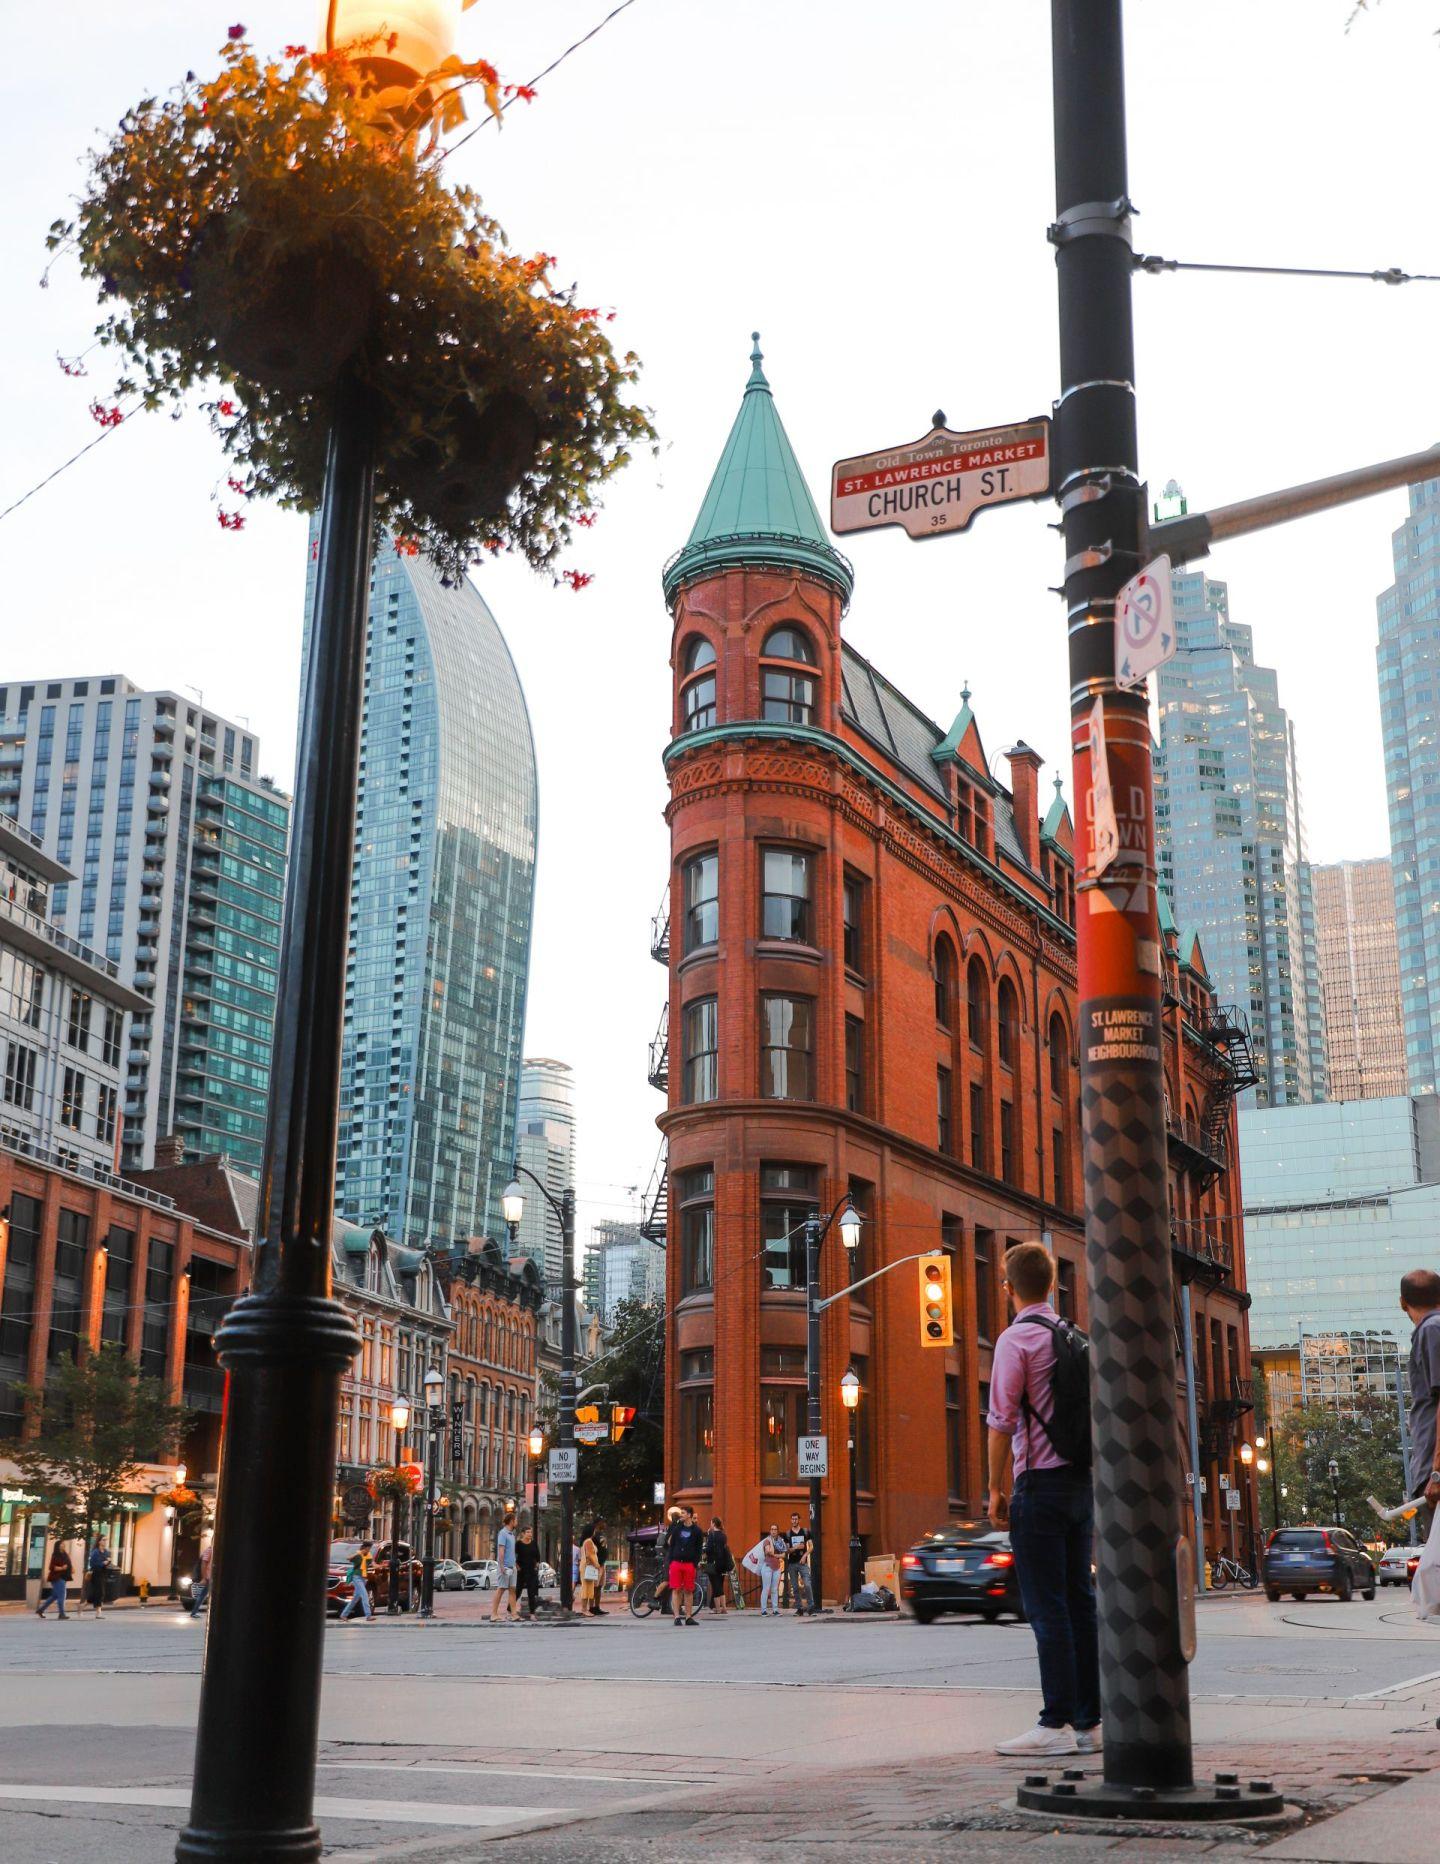 The flat iron Toronto